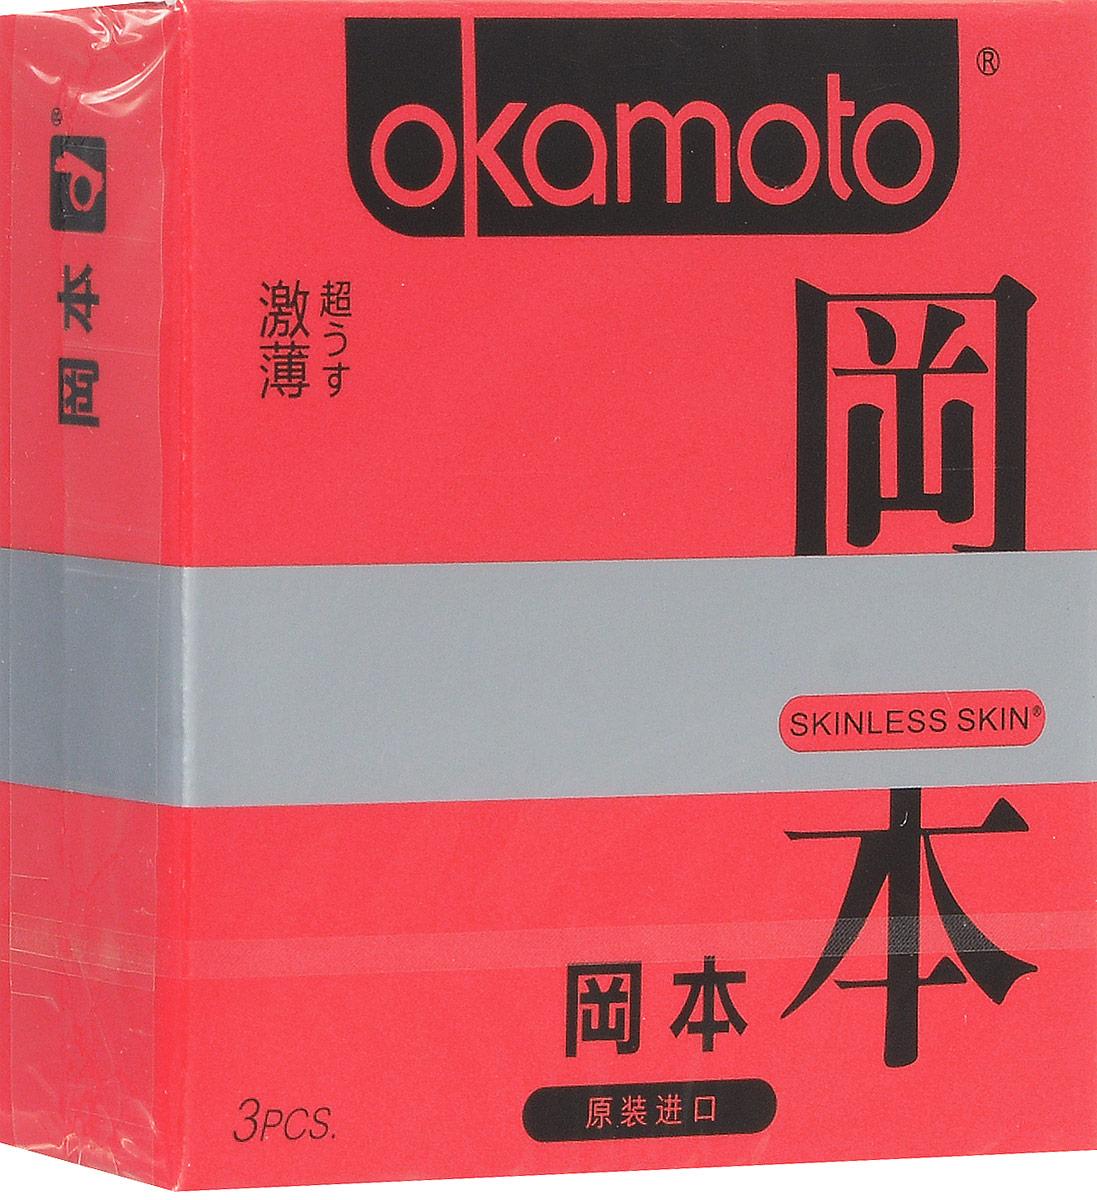 Презервативы Okamoto Skinless Skin Super Thin, ультратонкие, No.3